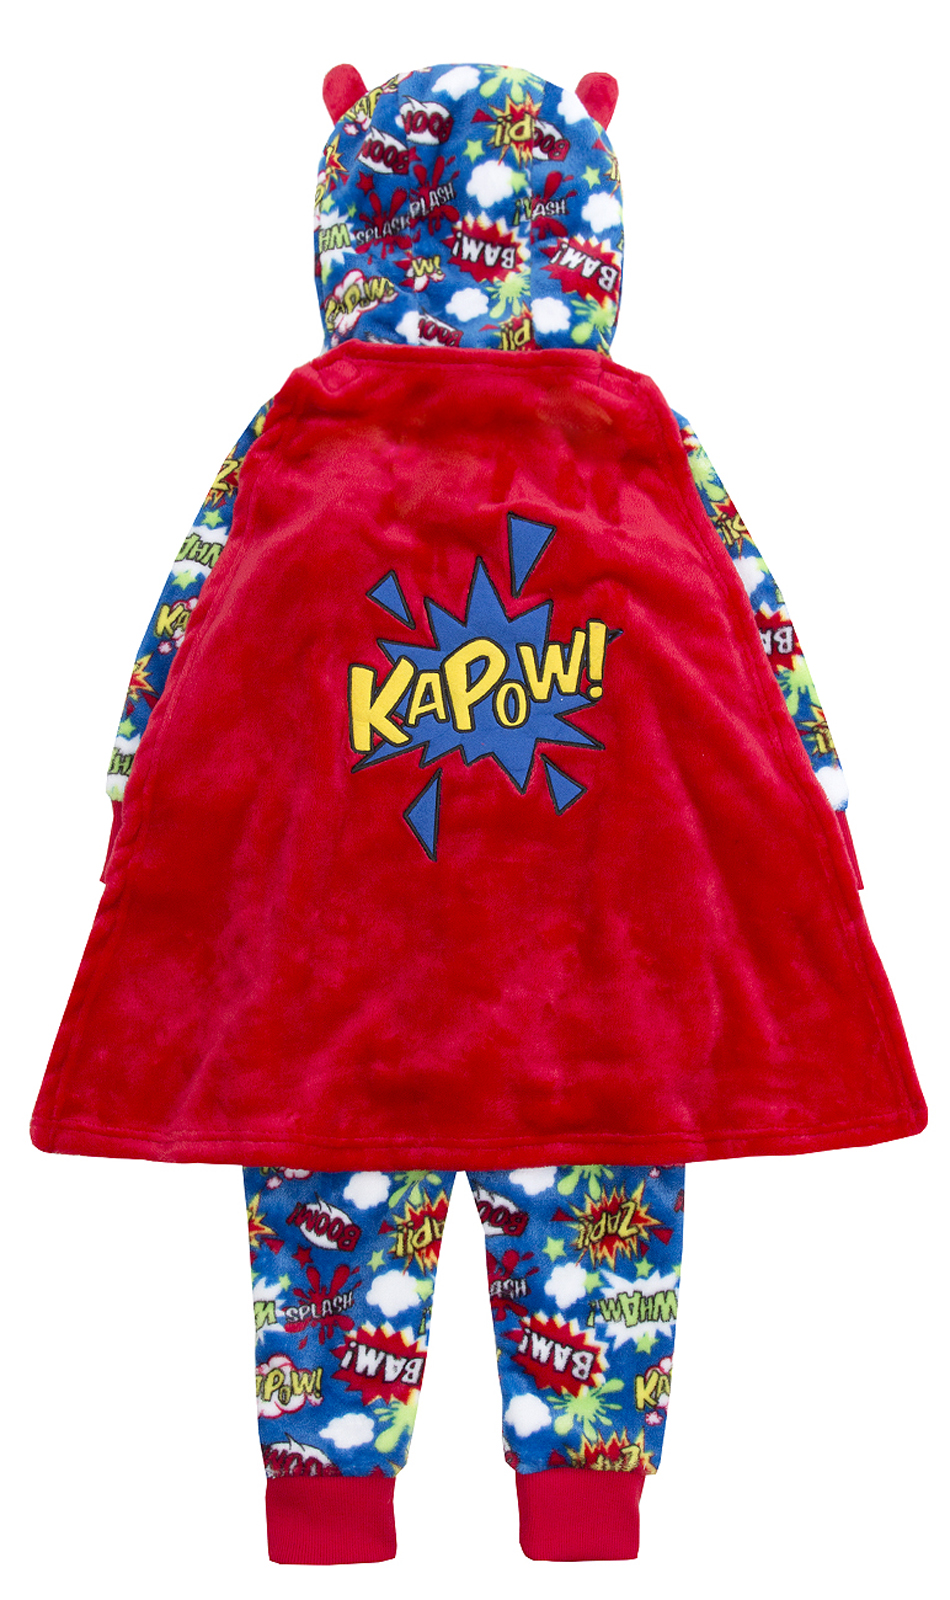 910f8e534c04 Boys Girls 3D Novelty All In One Onezee Dress Up Fleece Kids Pyjamas ...